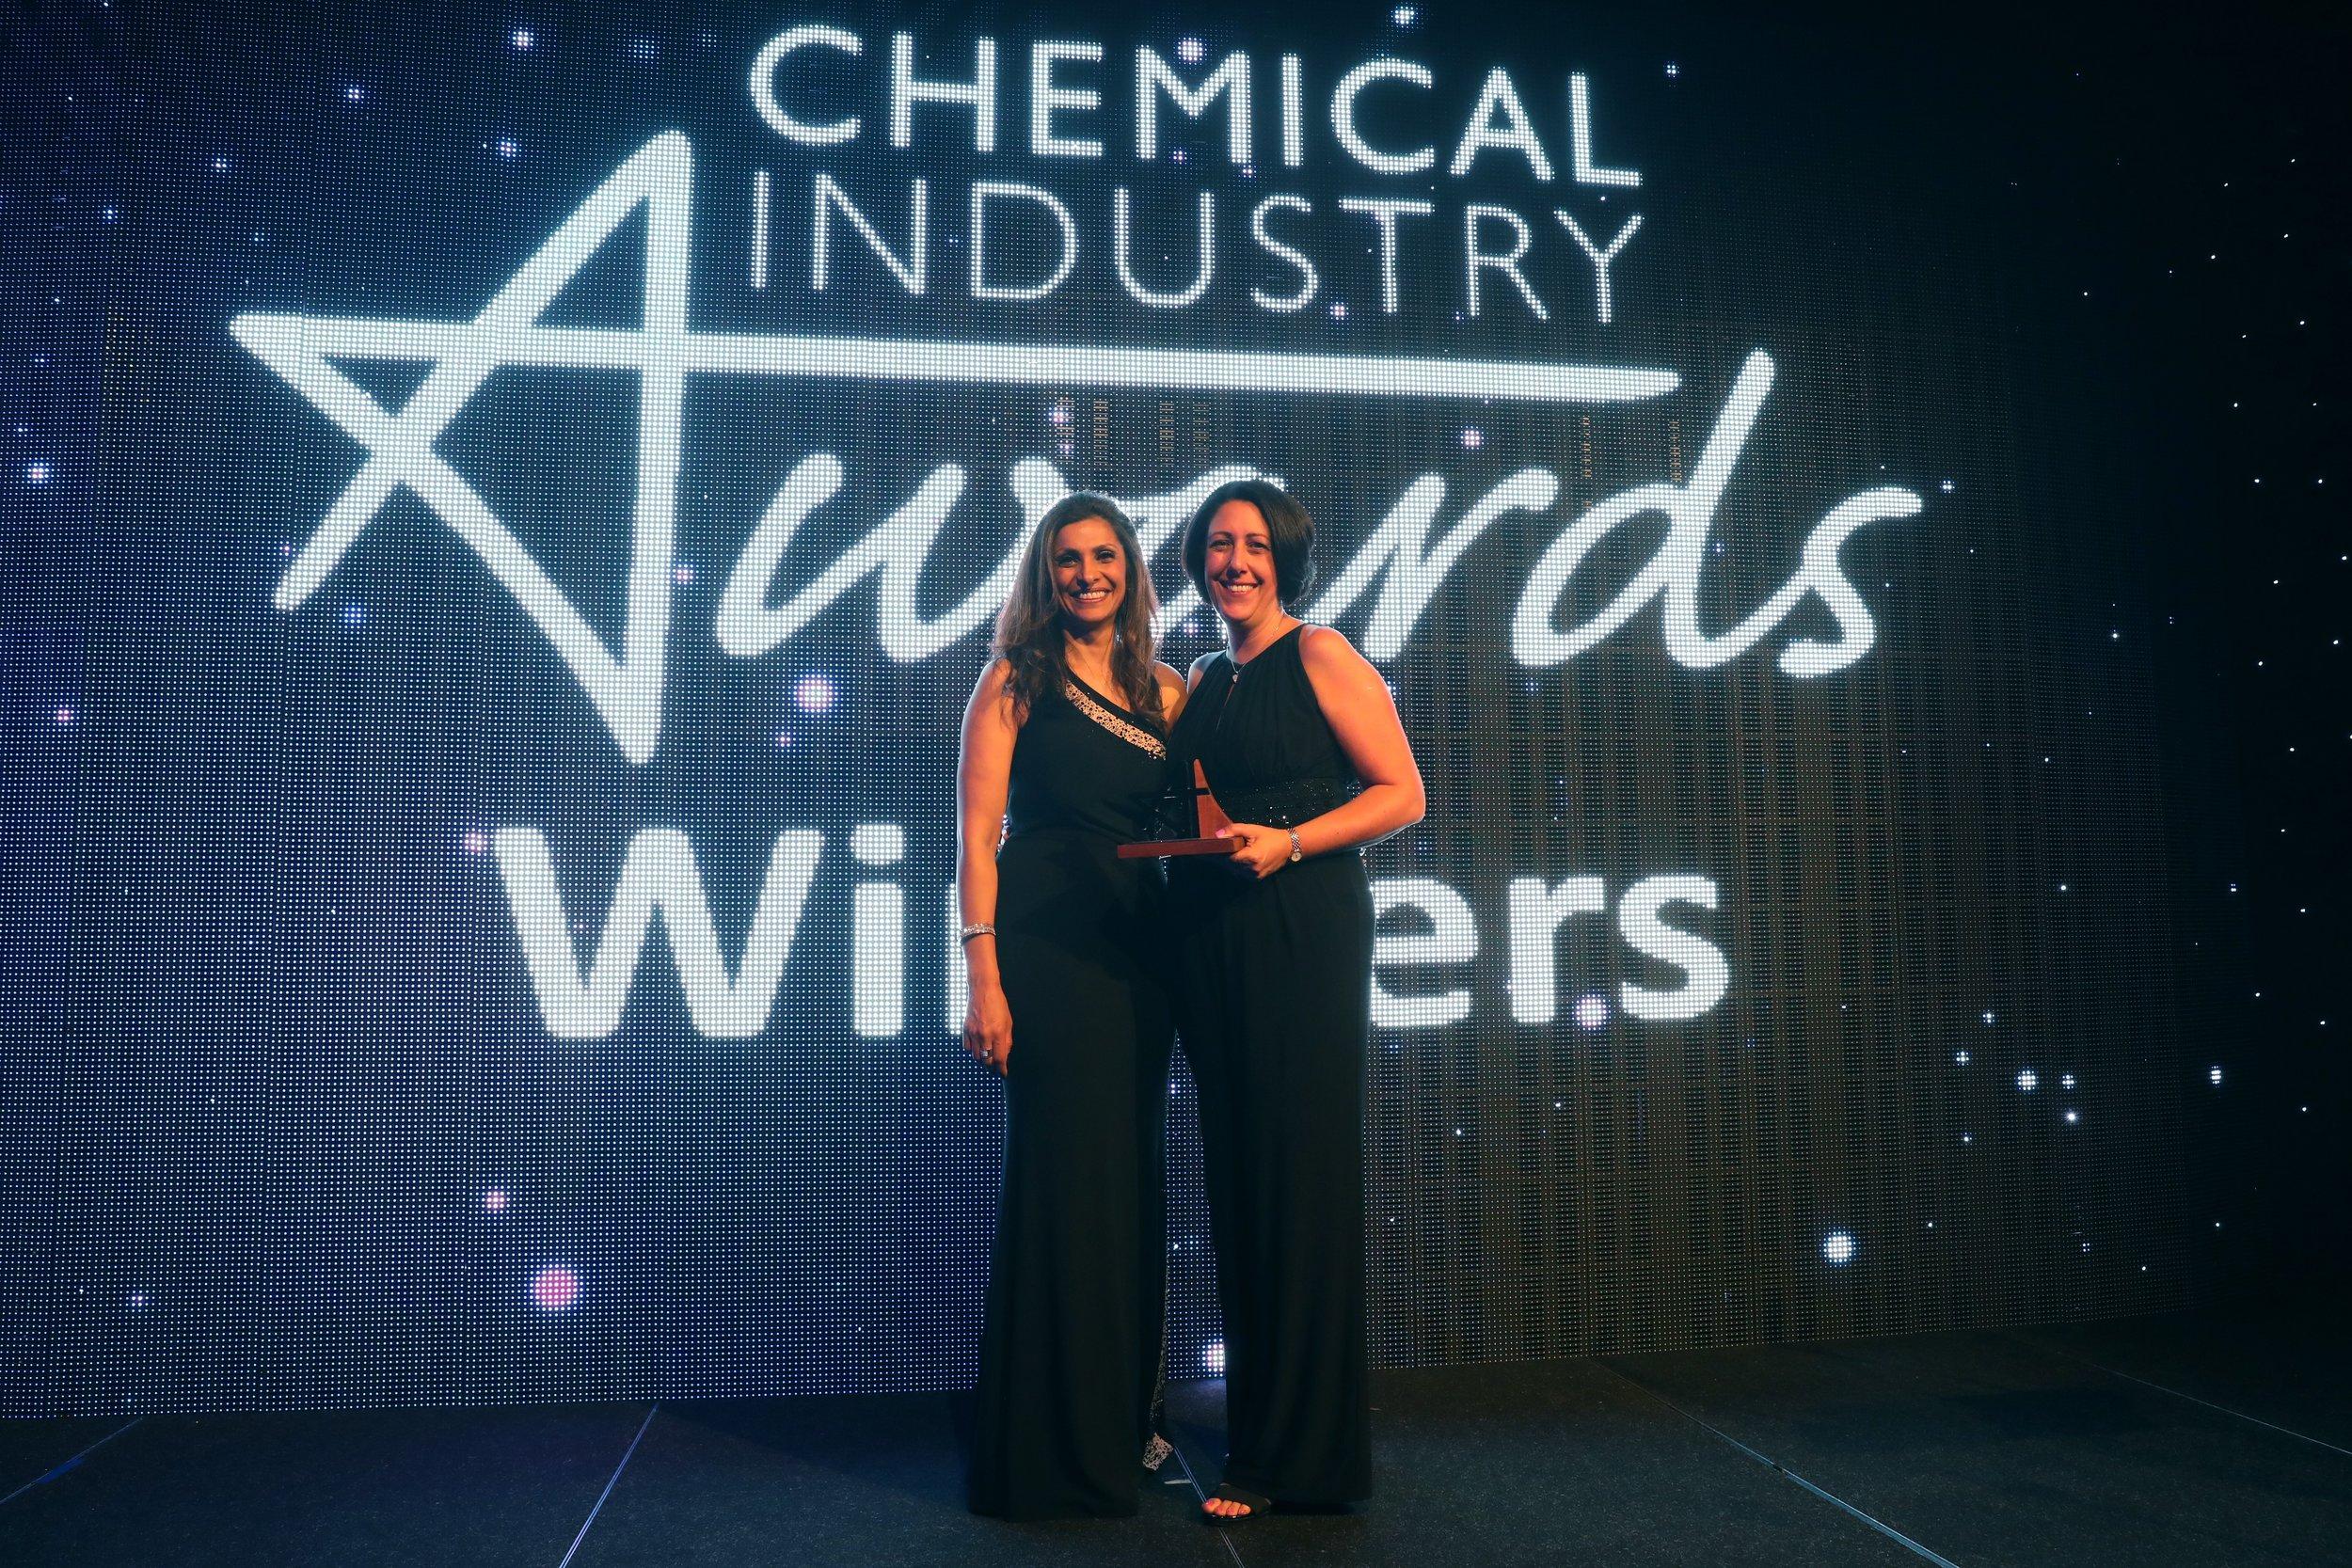 chemical_industry_awards232rev.jpg